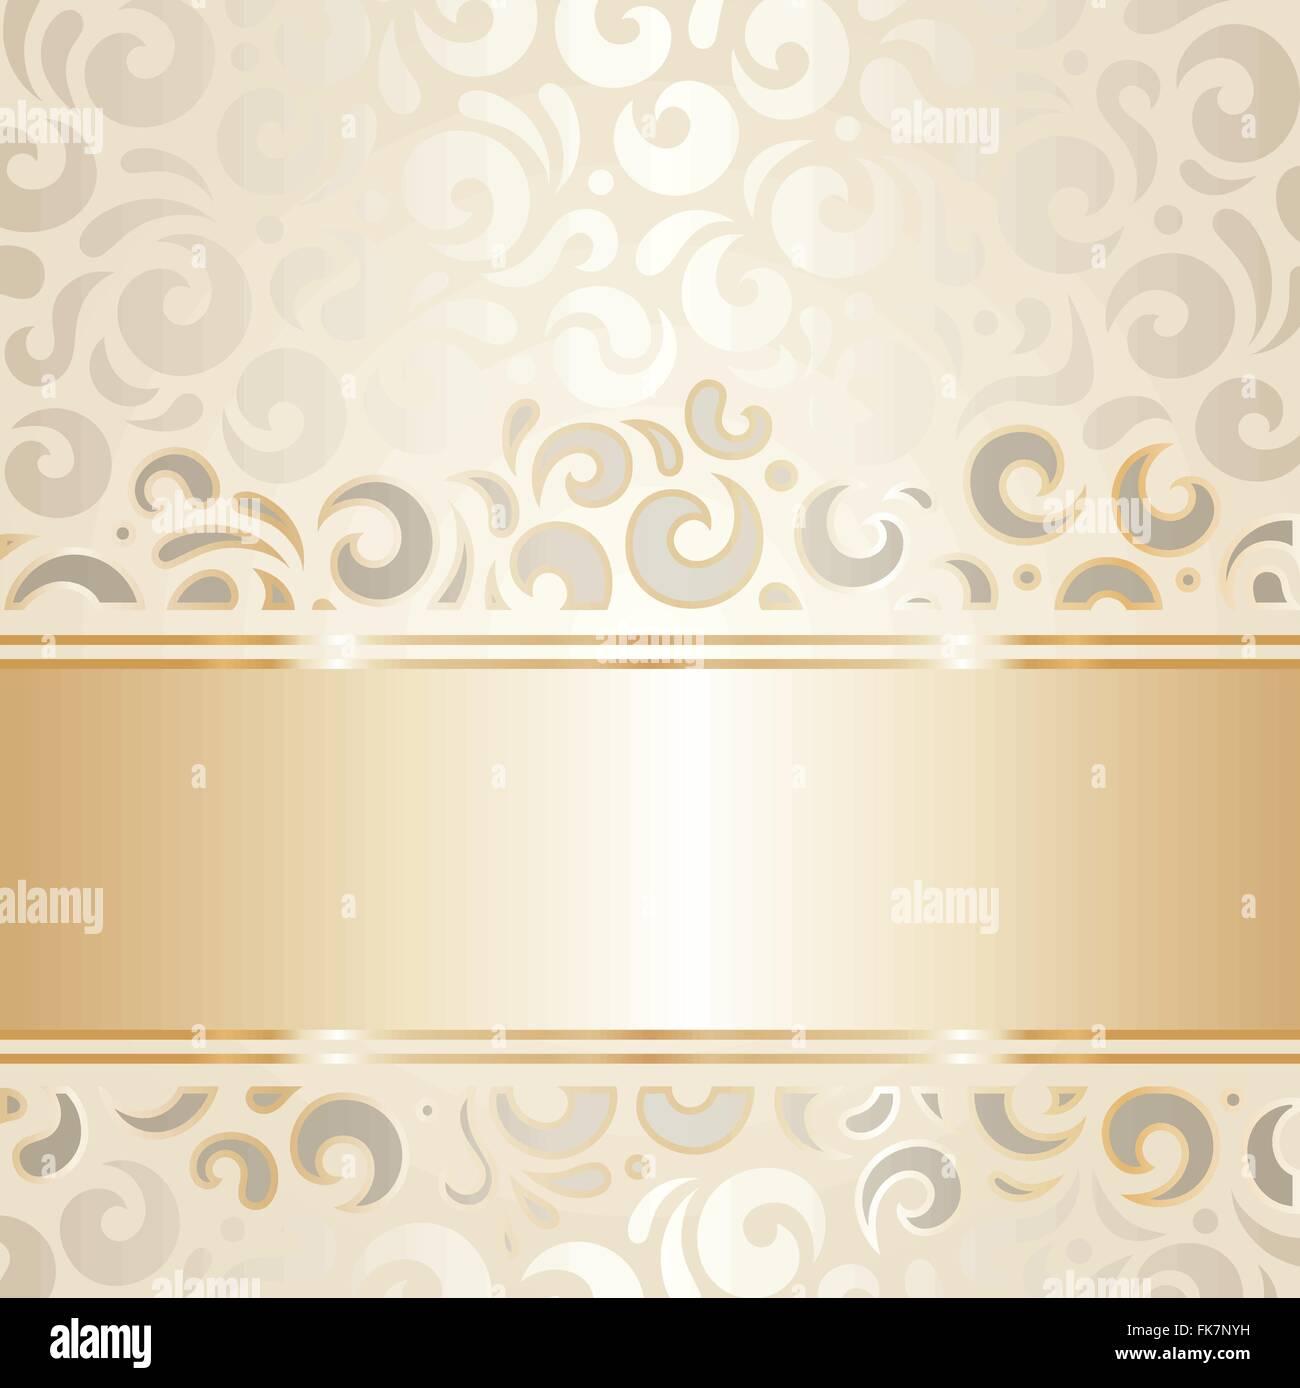 Retro wedding background wallpaper design ecru gold for White wedding wallpaper